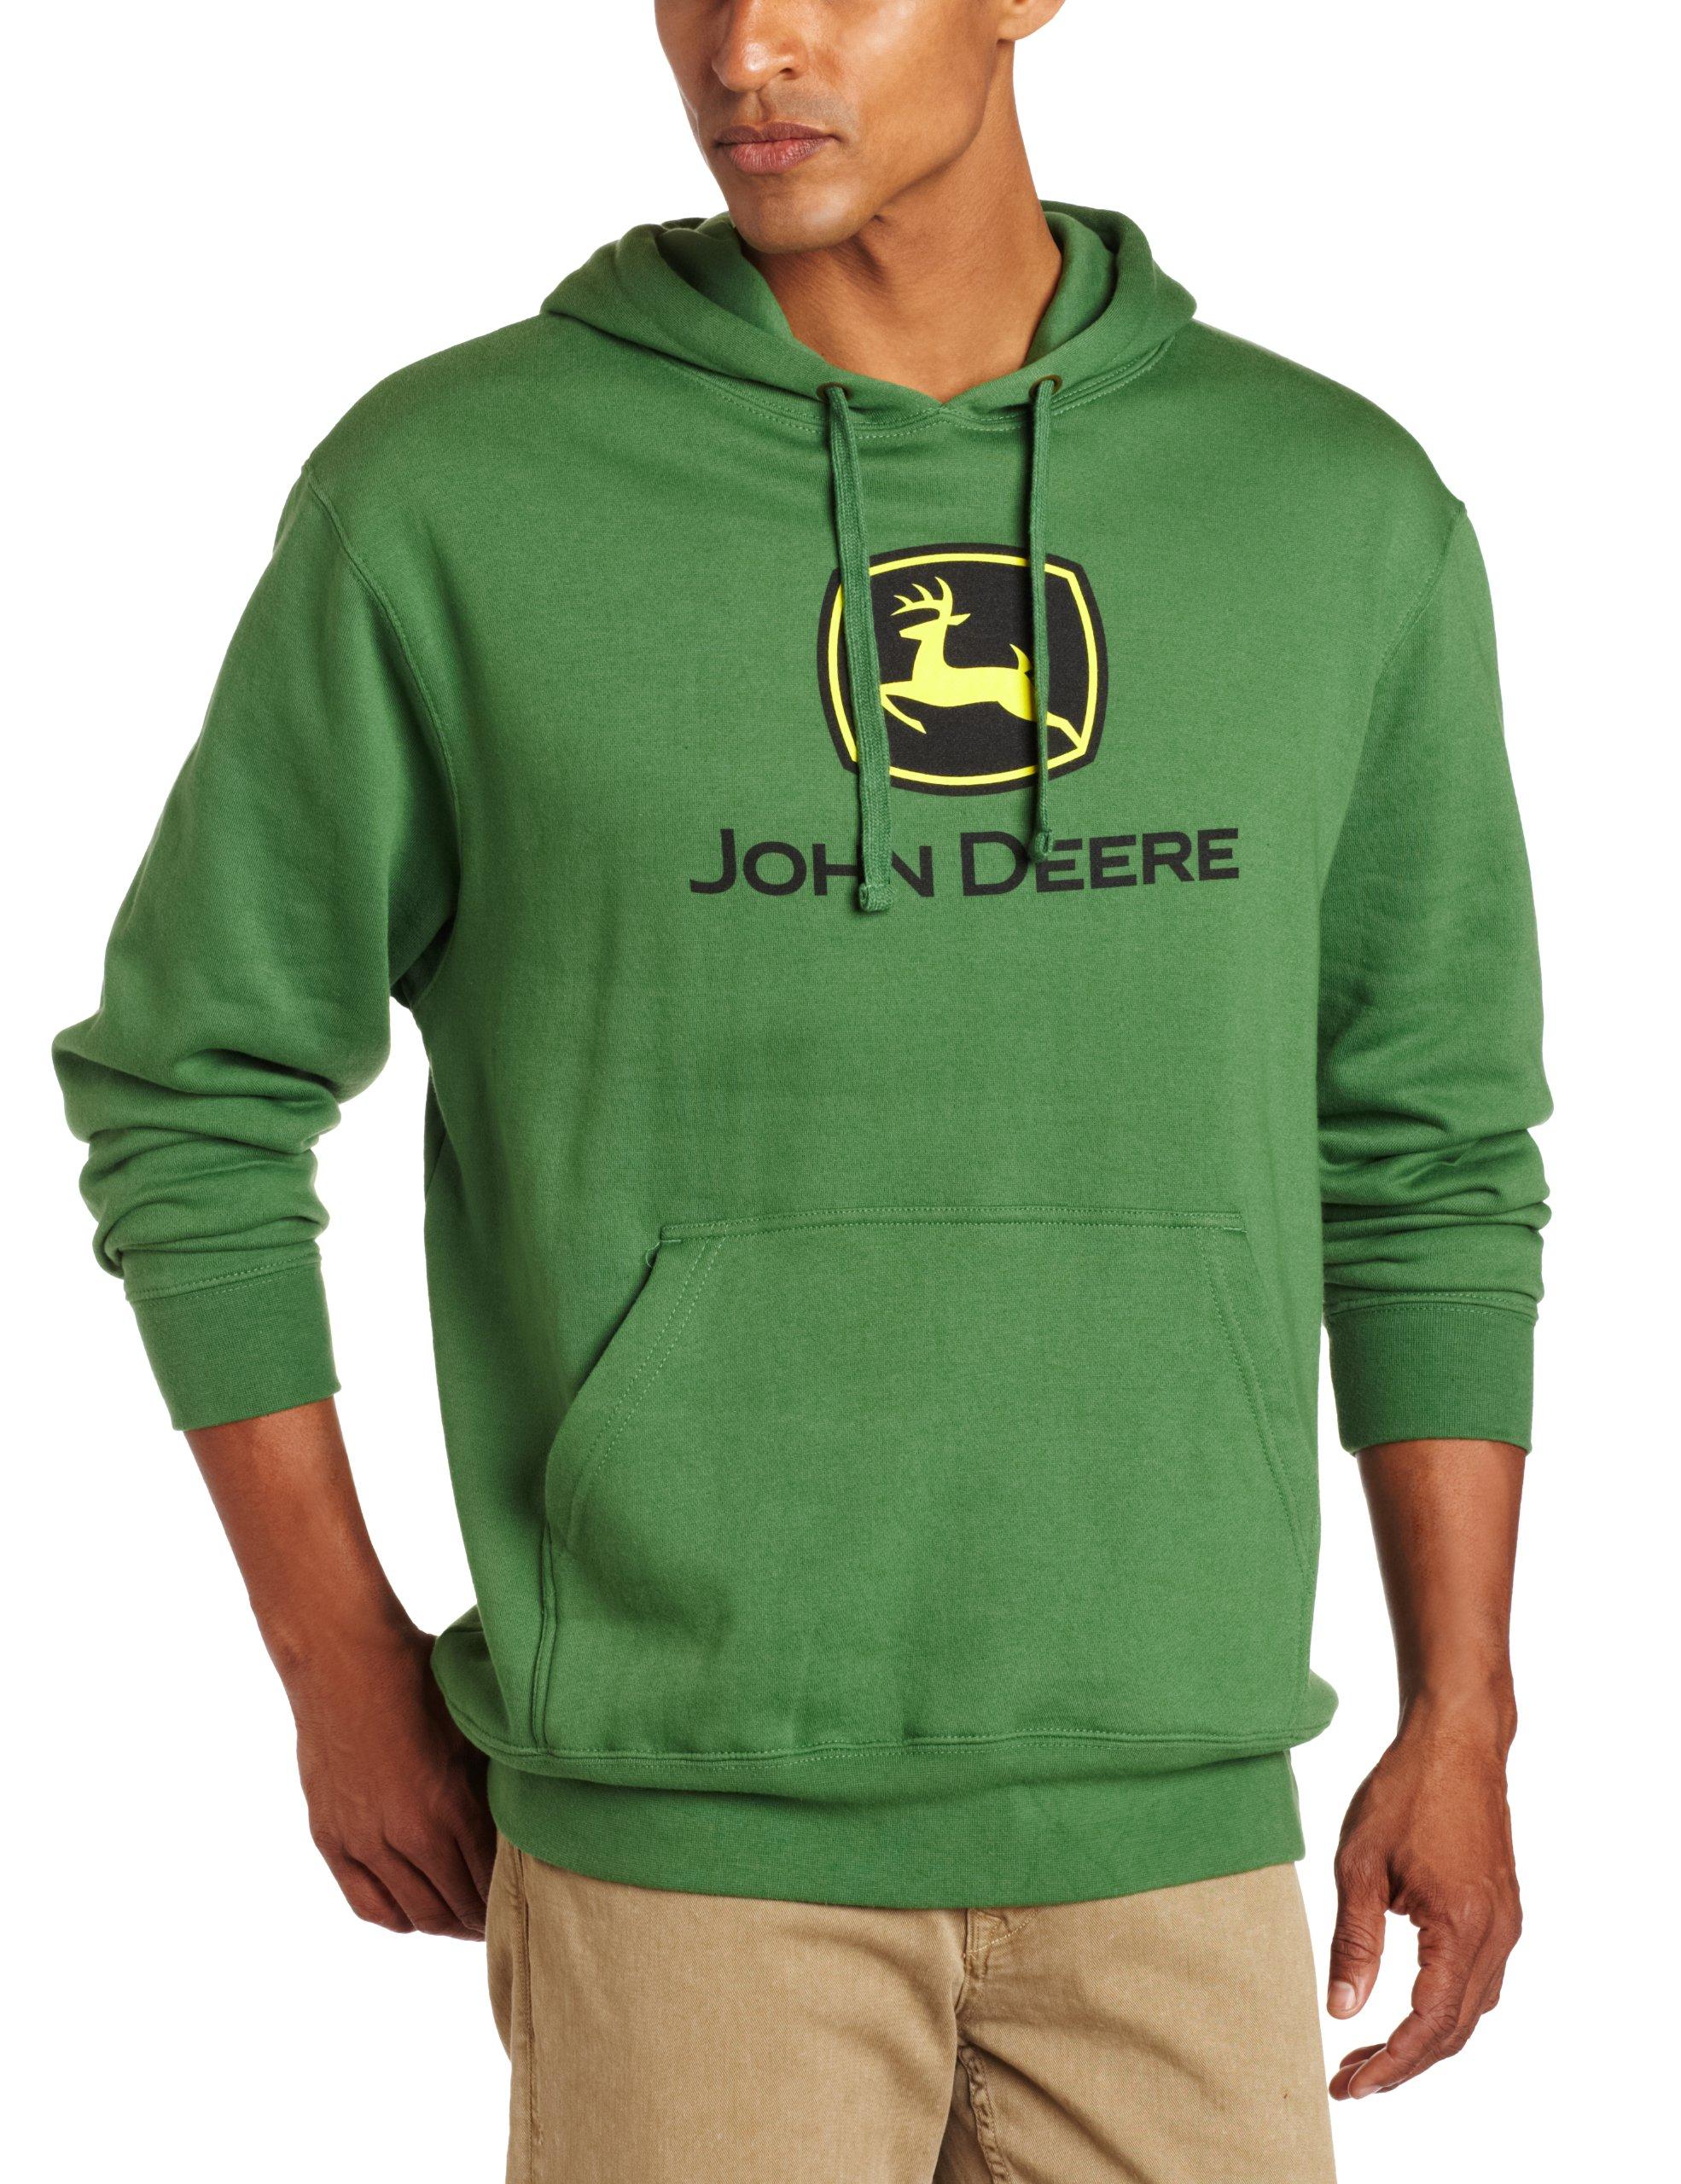 John Deere Hooded Sweatshirt Green